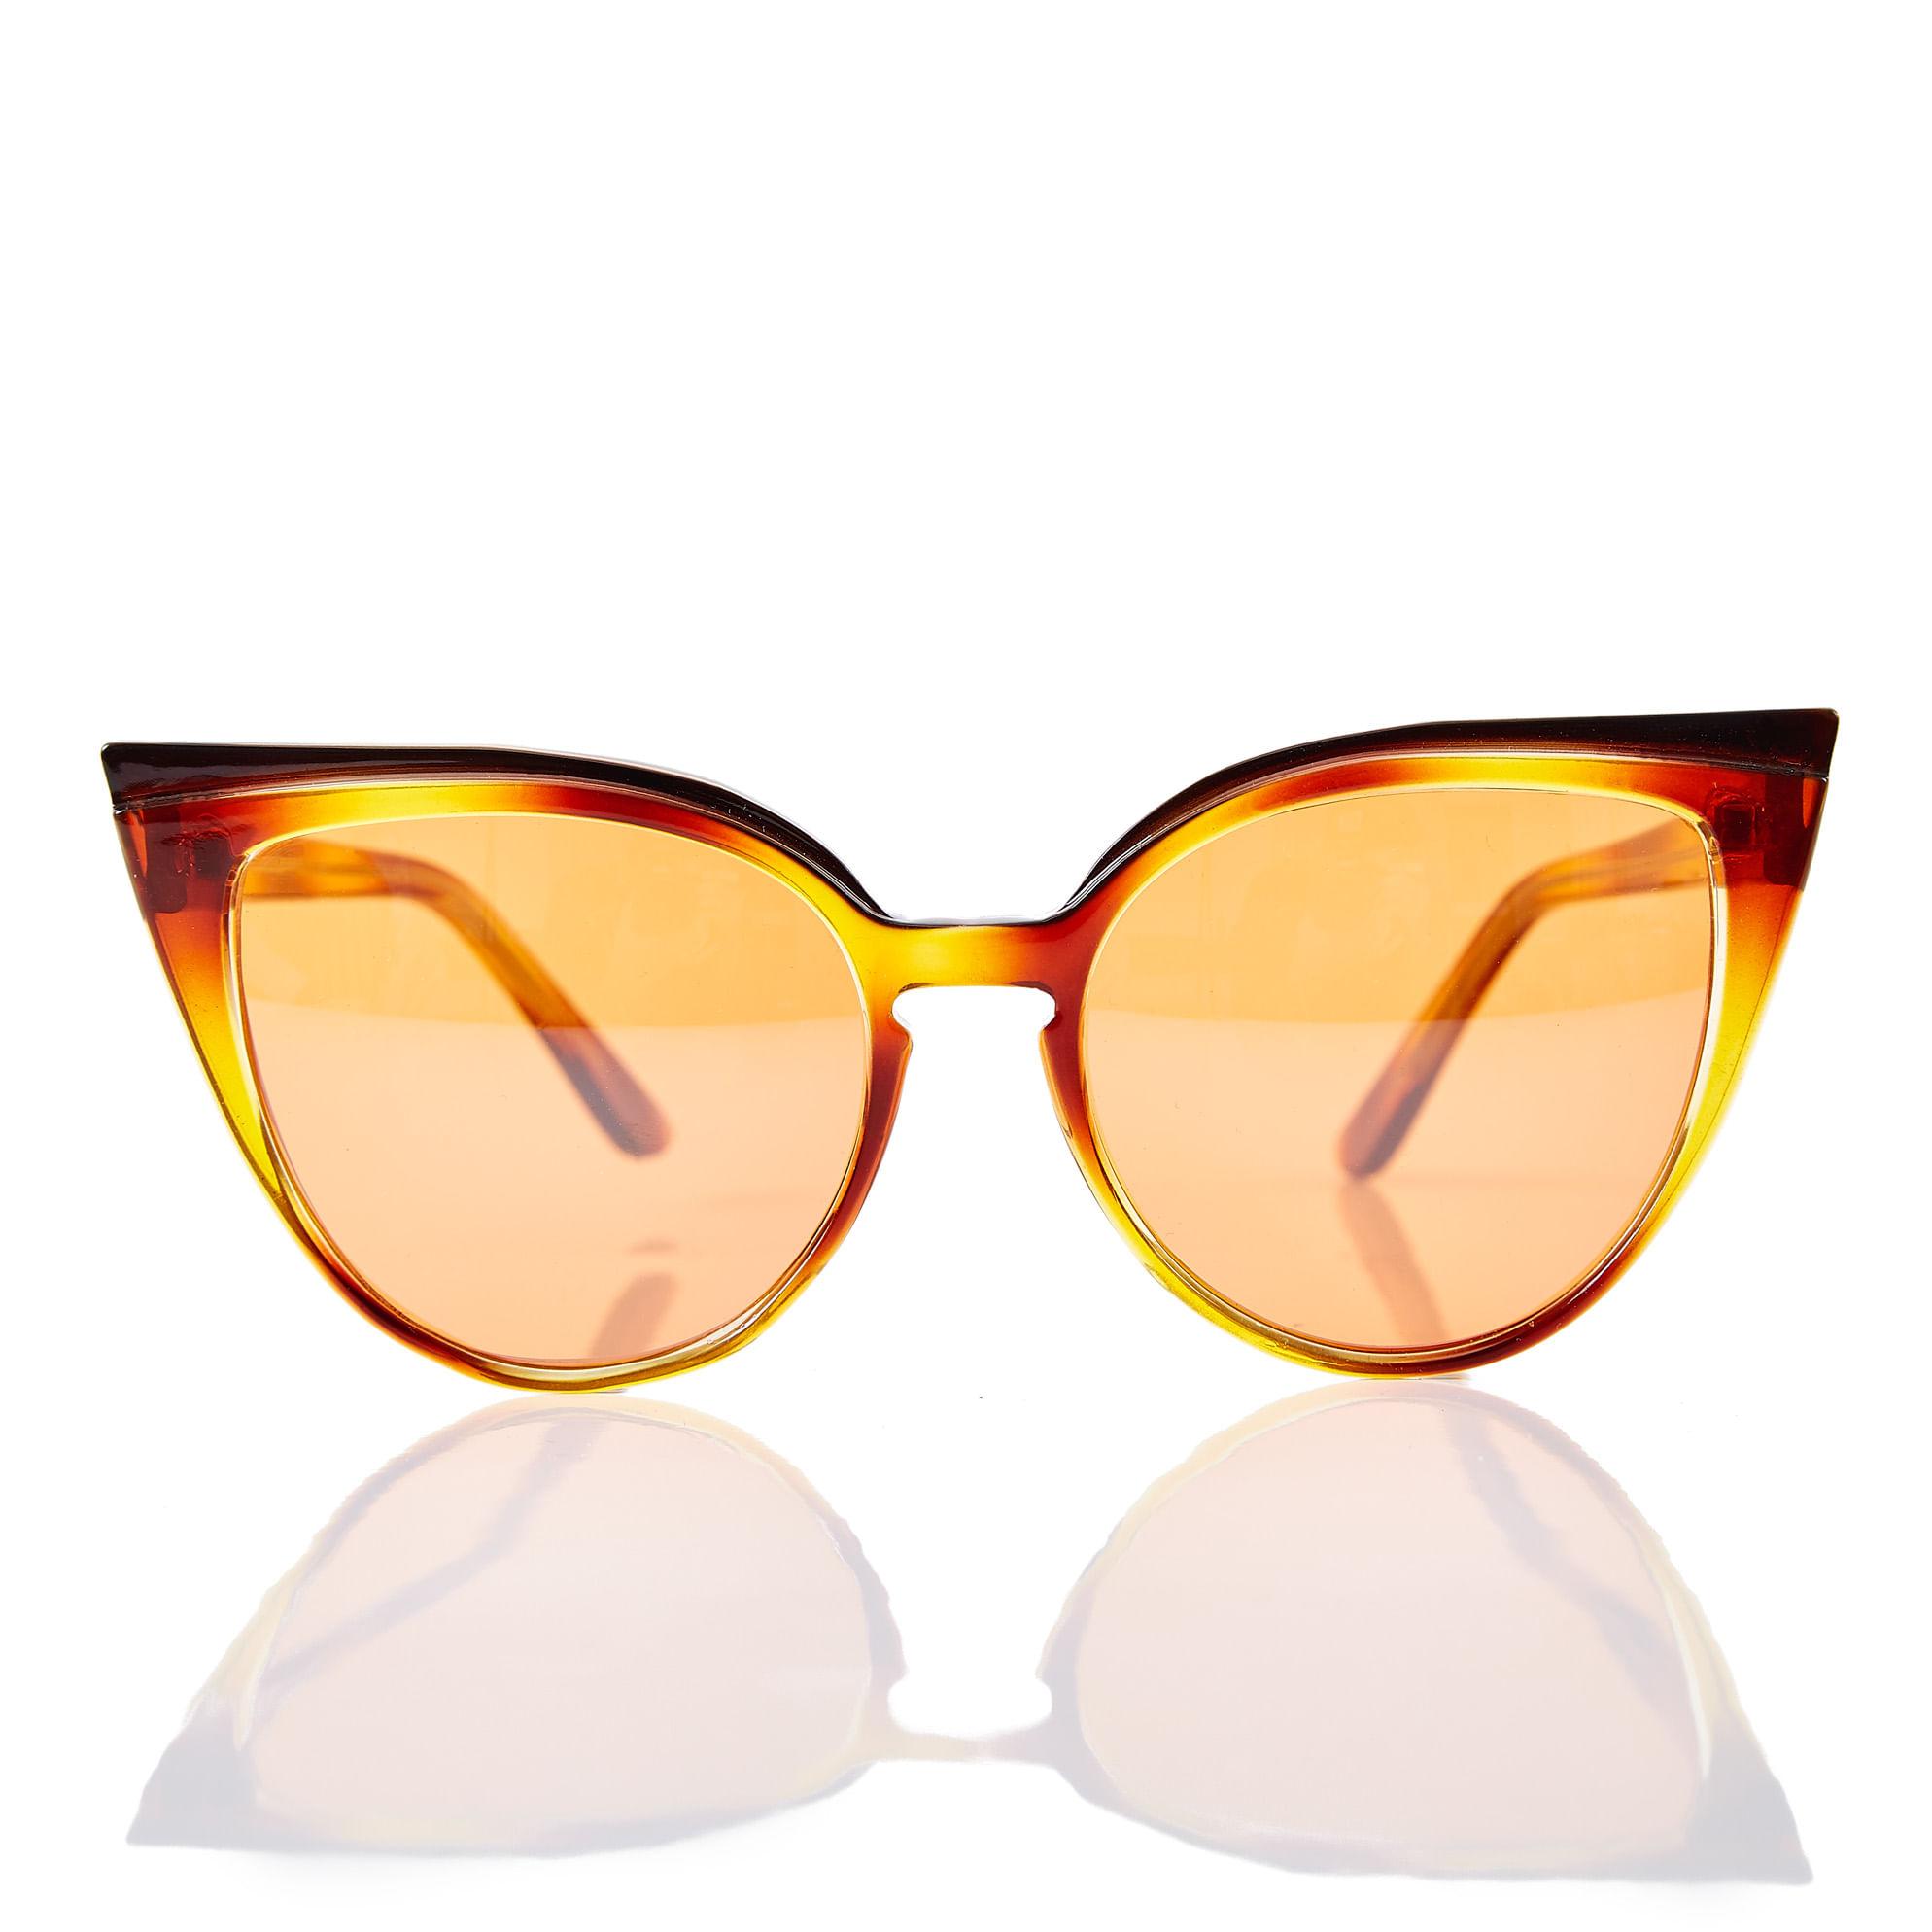 a7ff45264ea20 morenarosa · Acessórios · Óculos · Oculos Max Gatinho Degrade  Laranja Marrom - TU